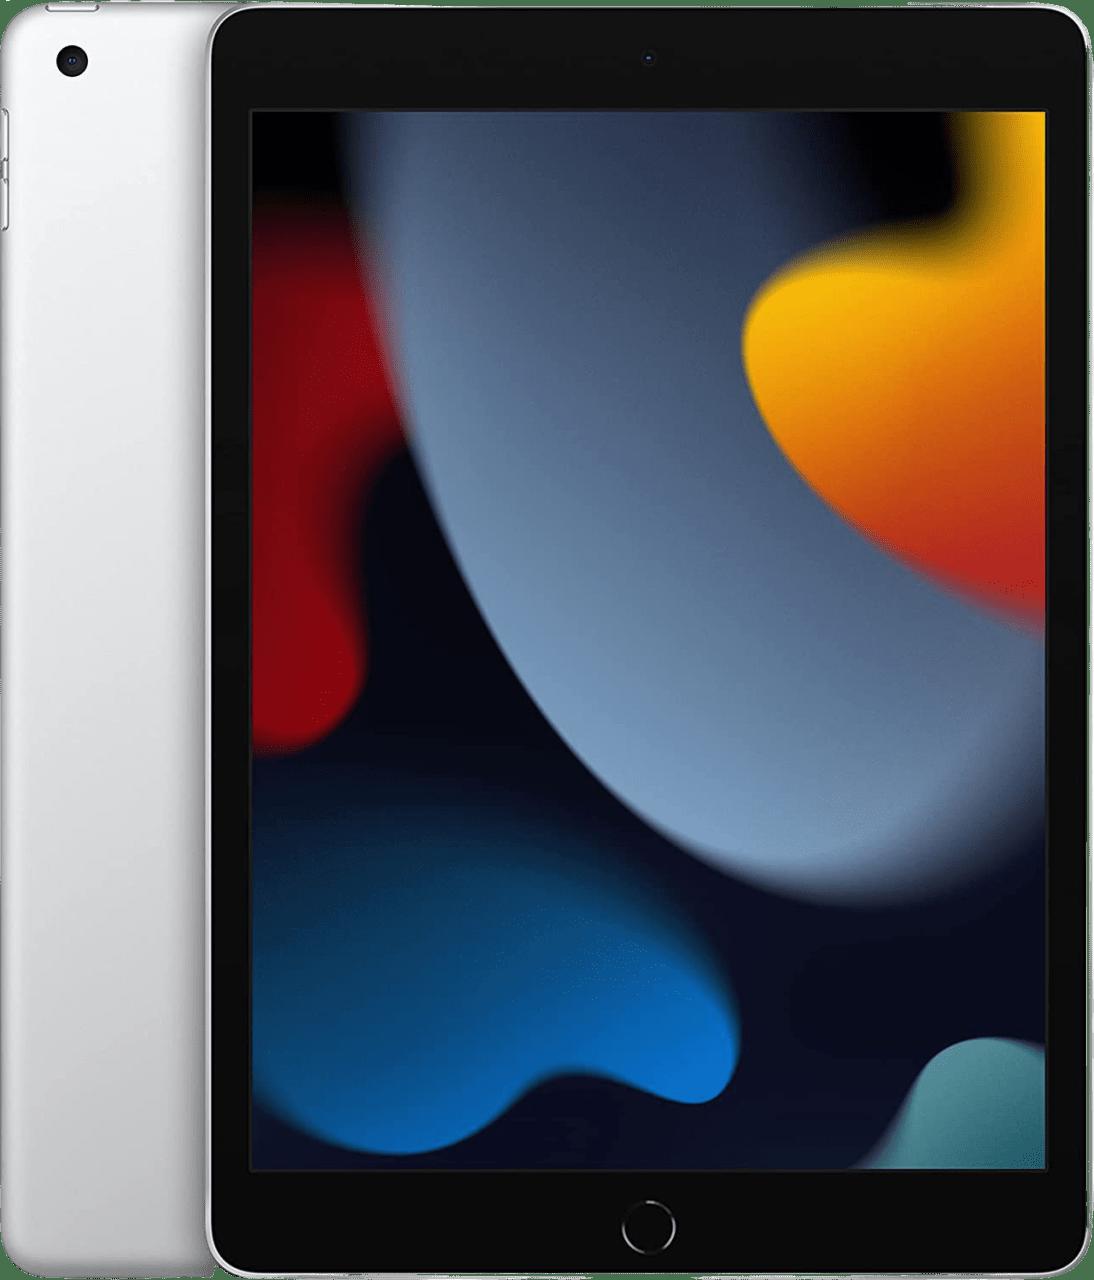 Plata Apple iPad (2021) - WiFi - iOS 15 - 256GB.1